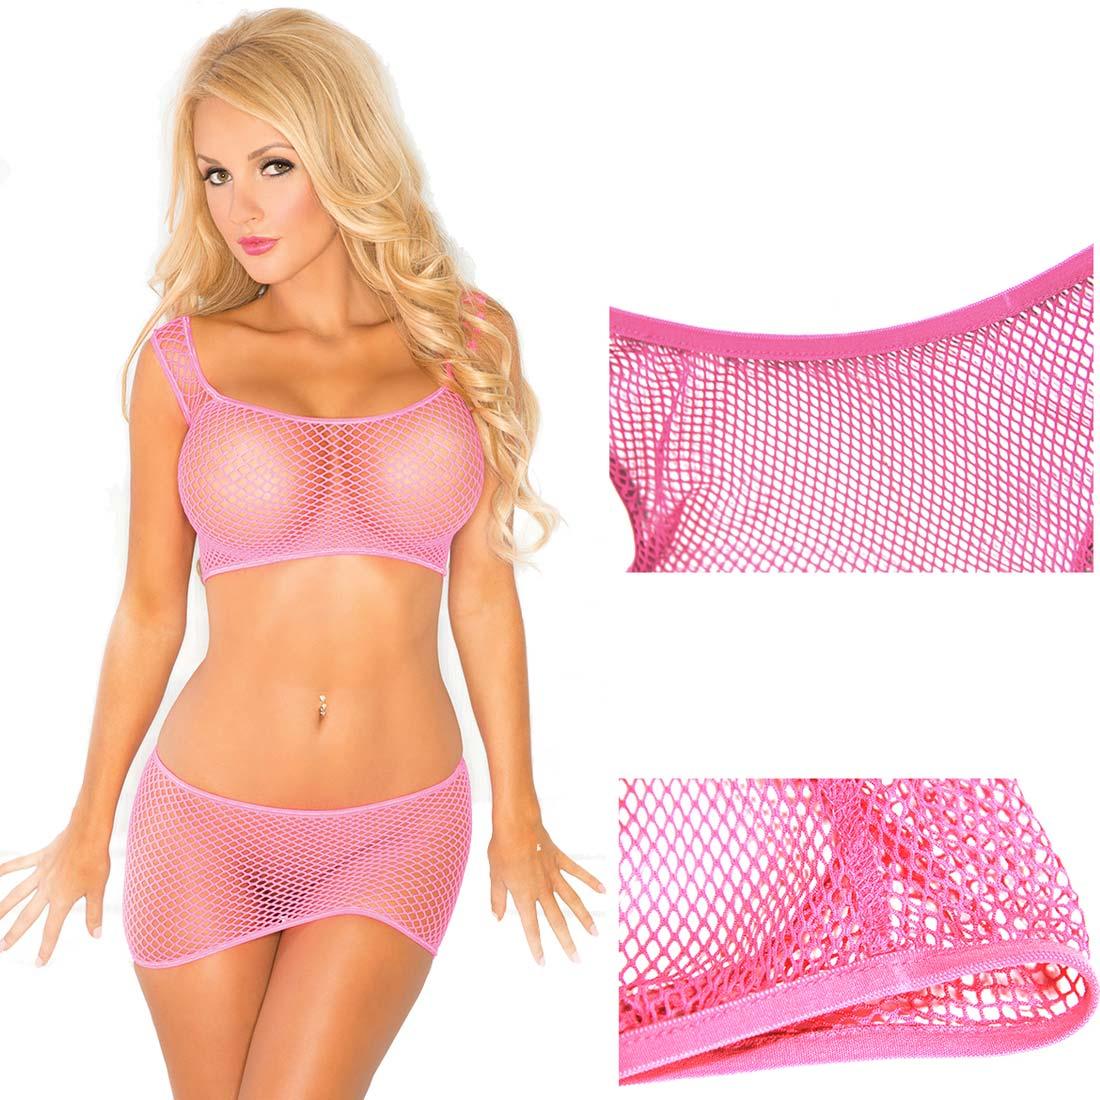 fishnet bikini models